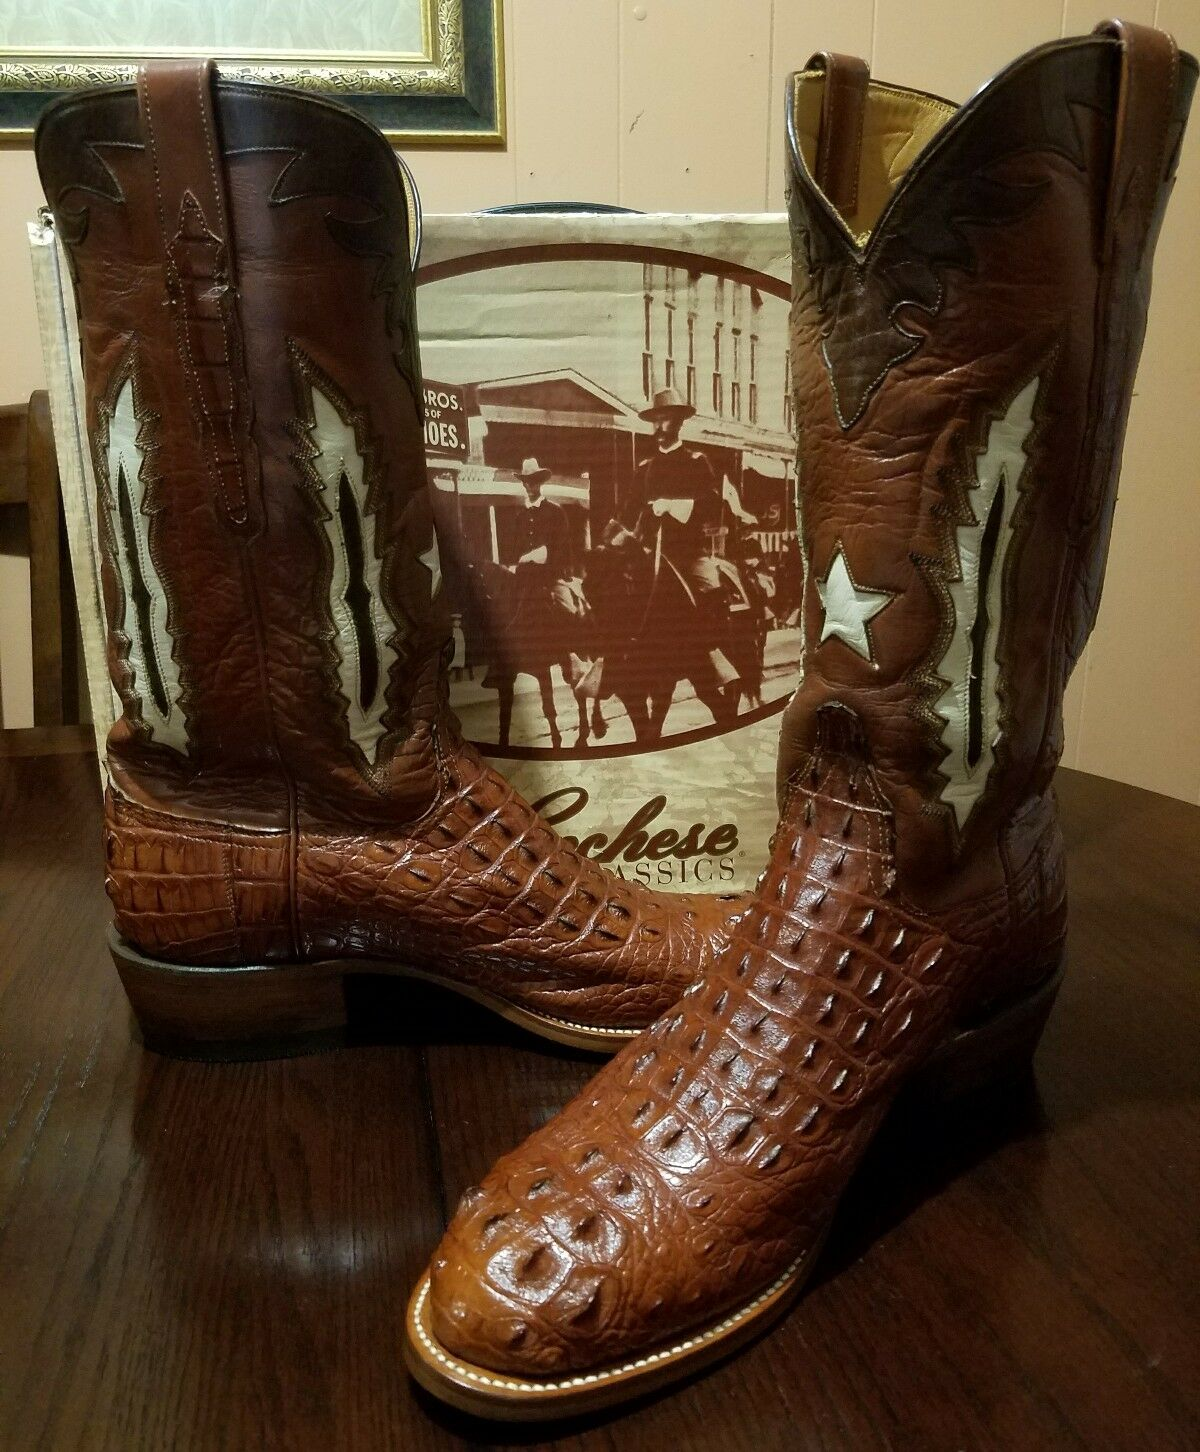 Lucchese Hecho a Mano Marrón Cuerno Back Cocodrilo Western Cowboy botas e (ancho)